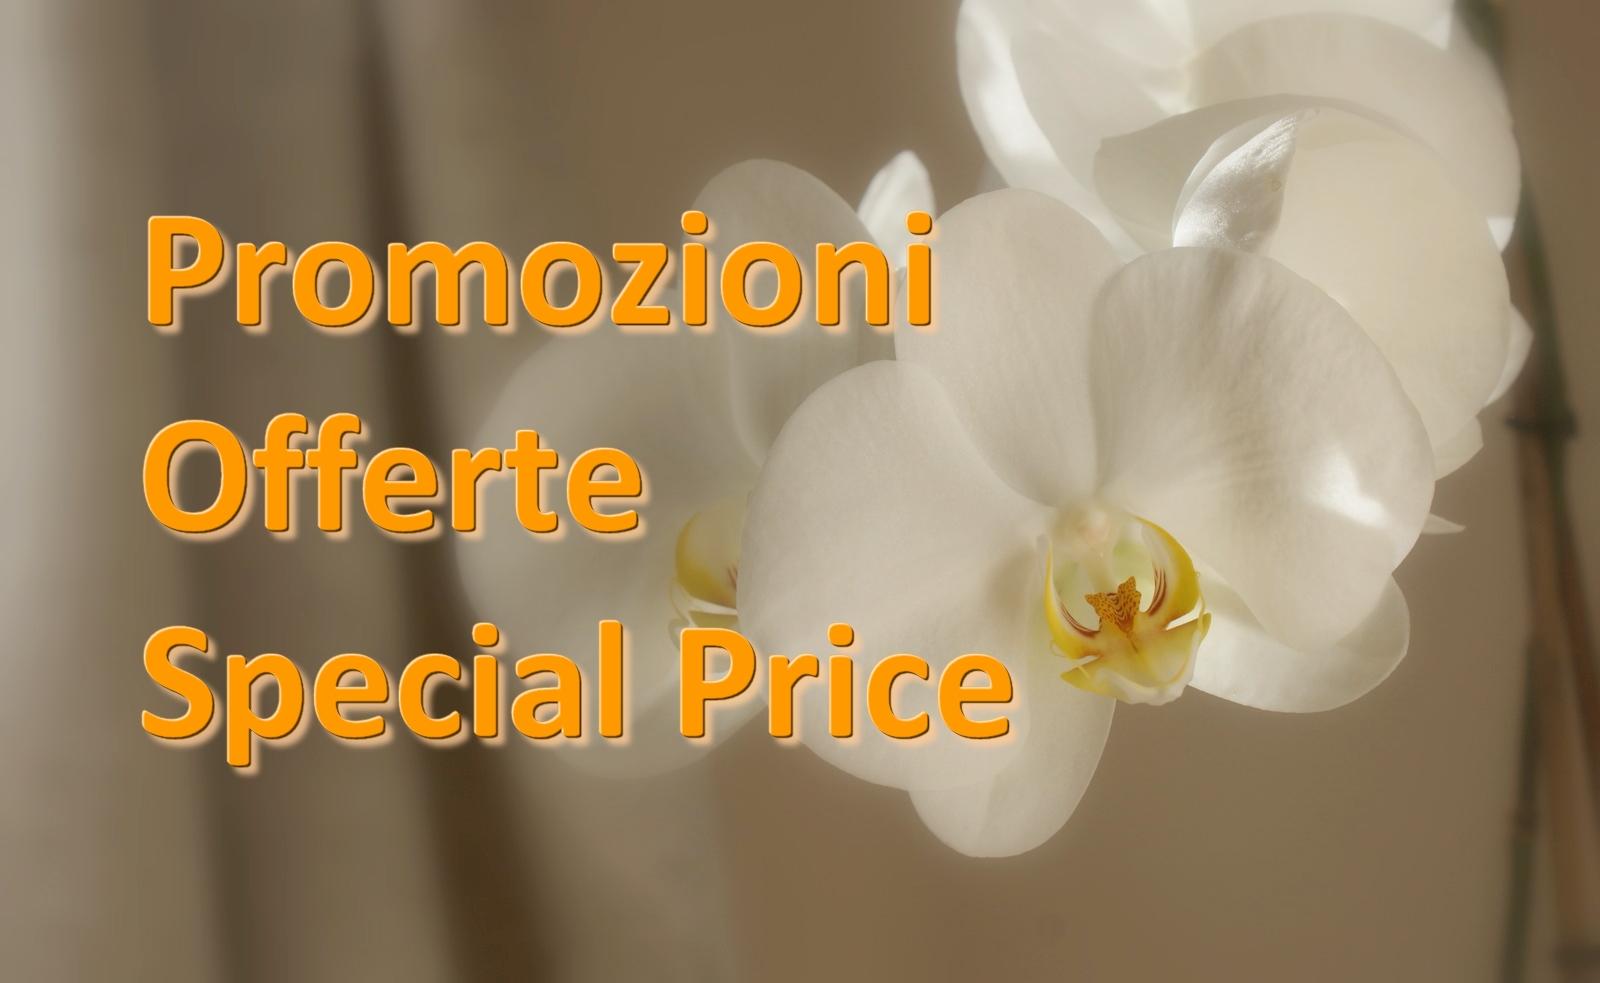 special price 1.jpg